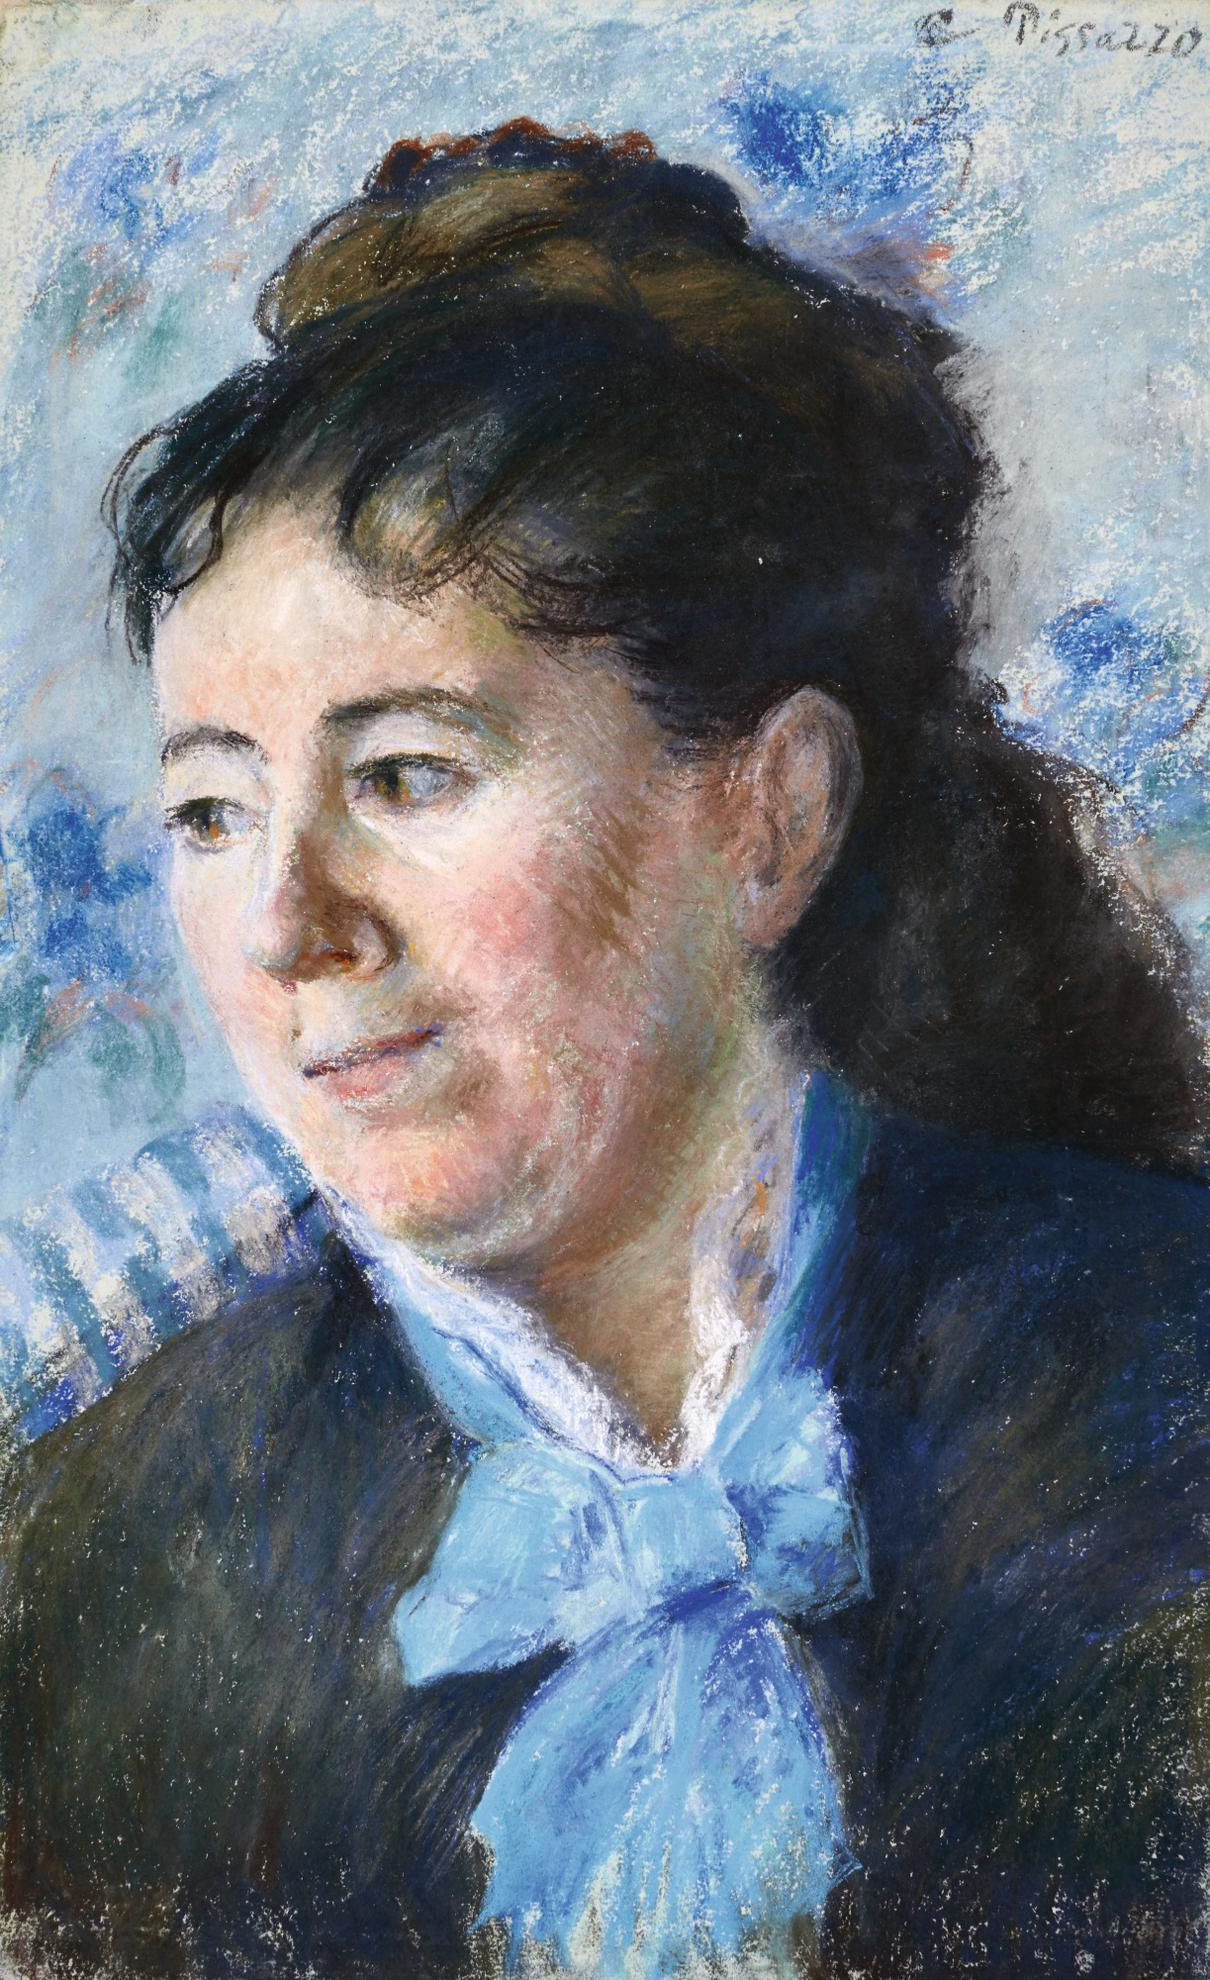 Camille Pissarro-Portrait De Felicie Vellay Estruc-1874